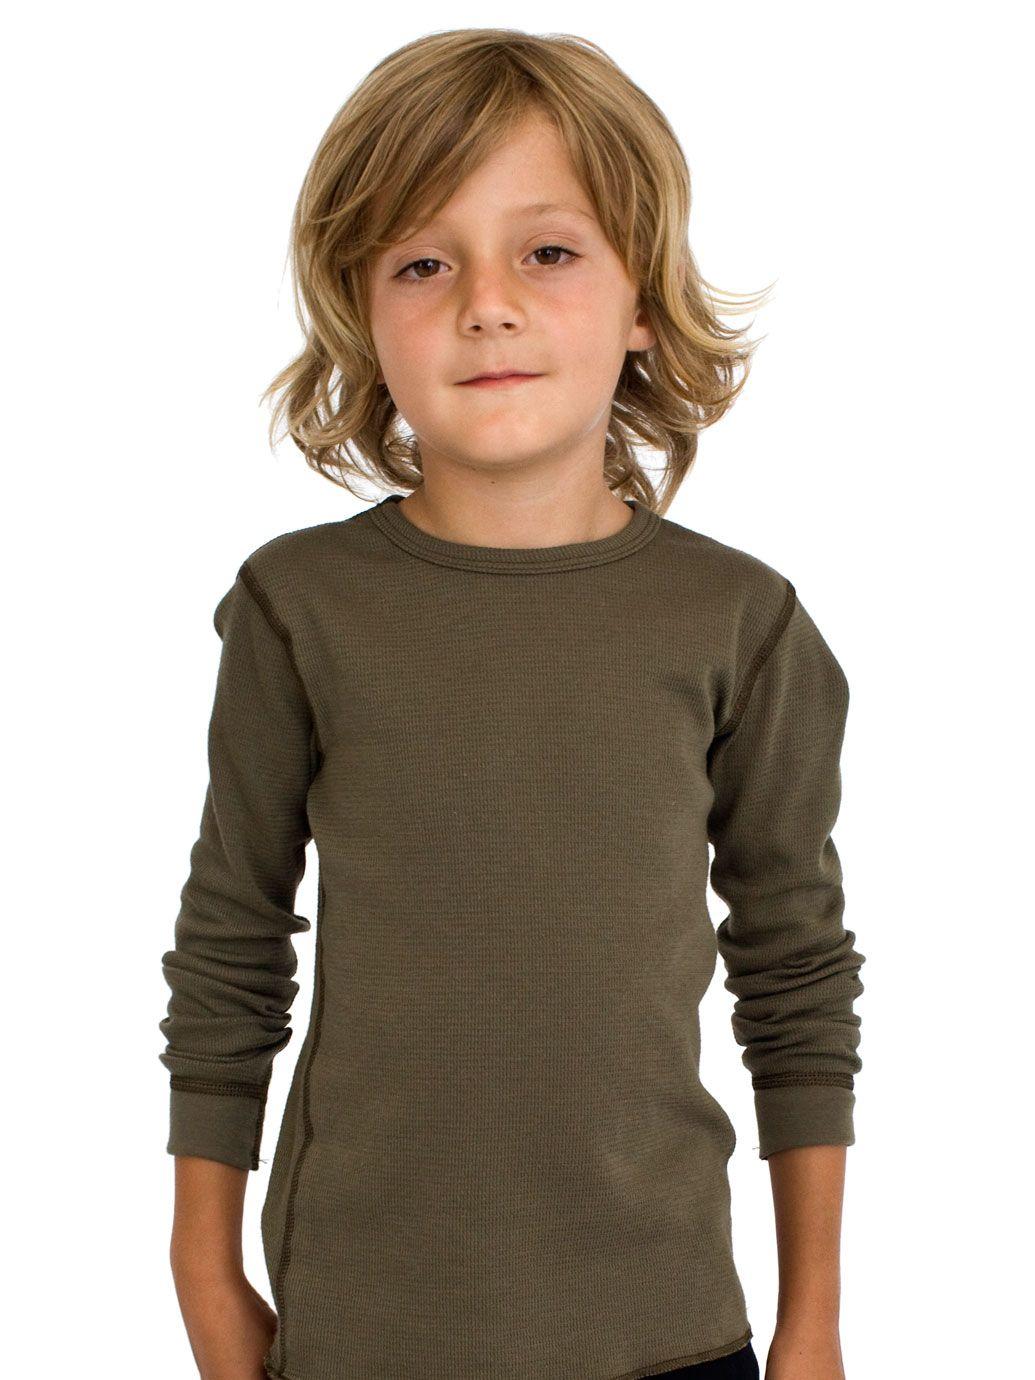 Pin By Iam Marie On Baby Boy In 2020 Kids Hairstyles Boys Long Hairstyles Boy Hairstyles